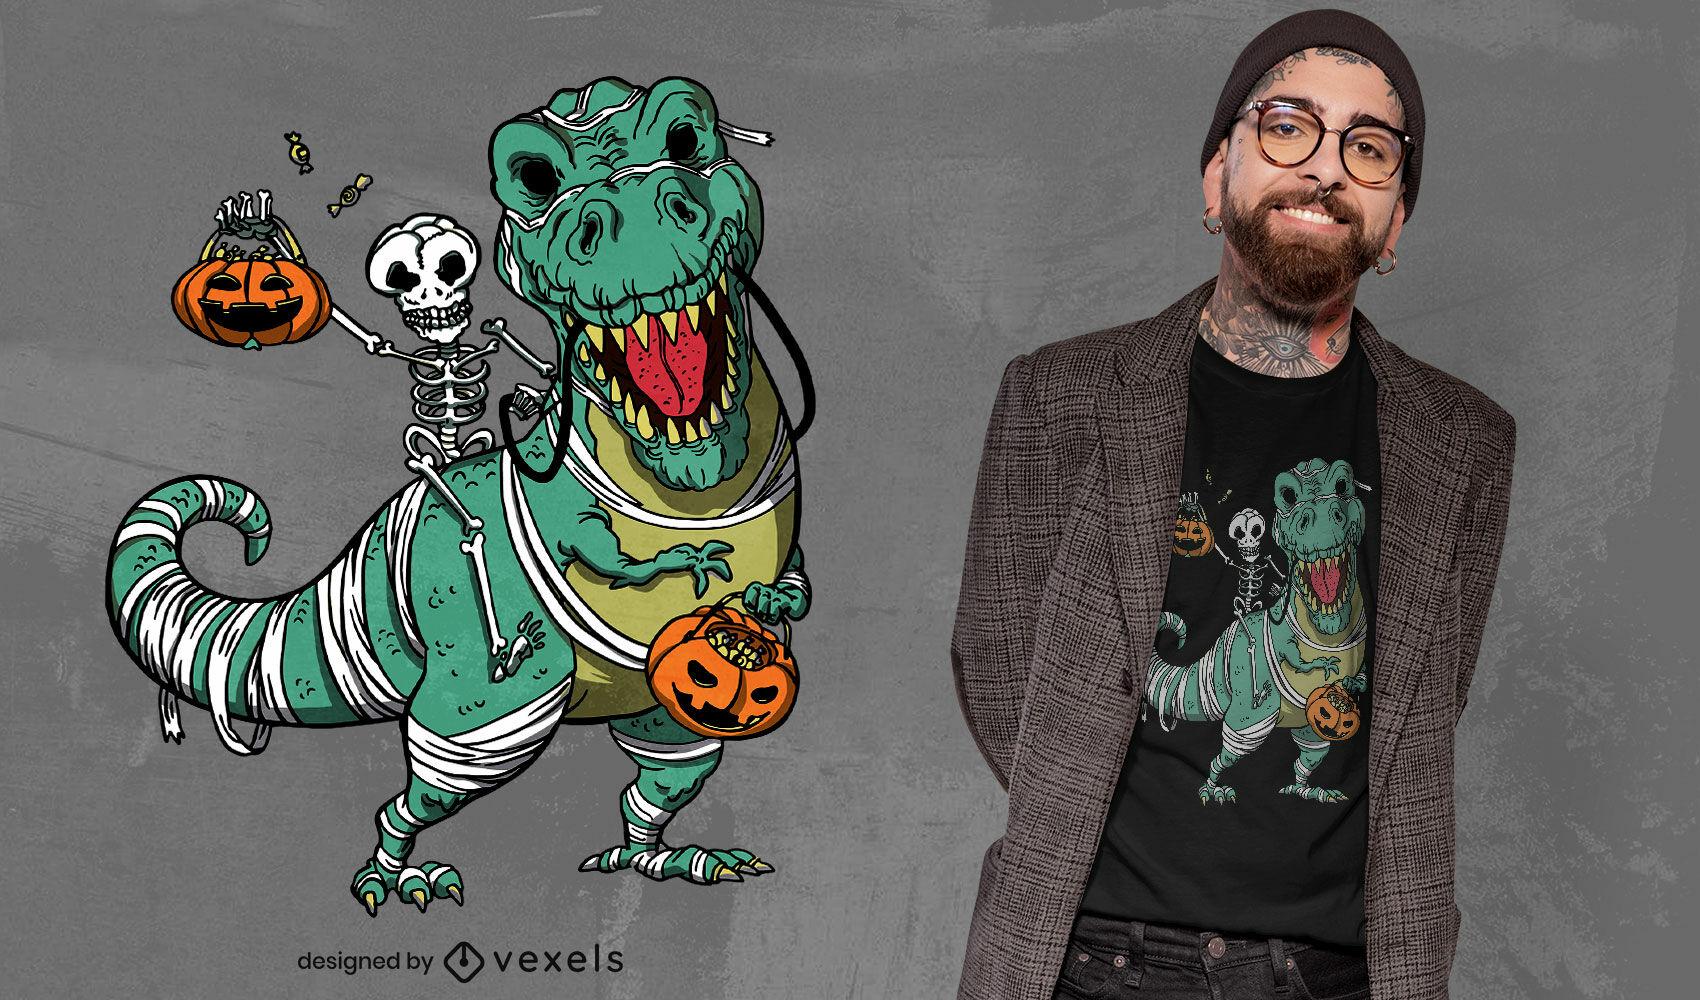 Skeleton and t-rex Halloween t-shirt design